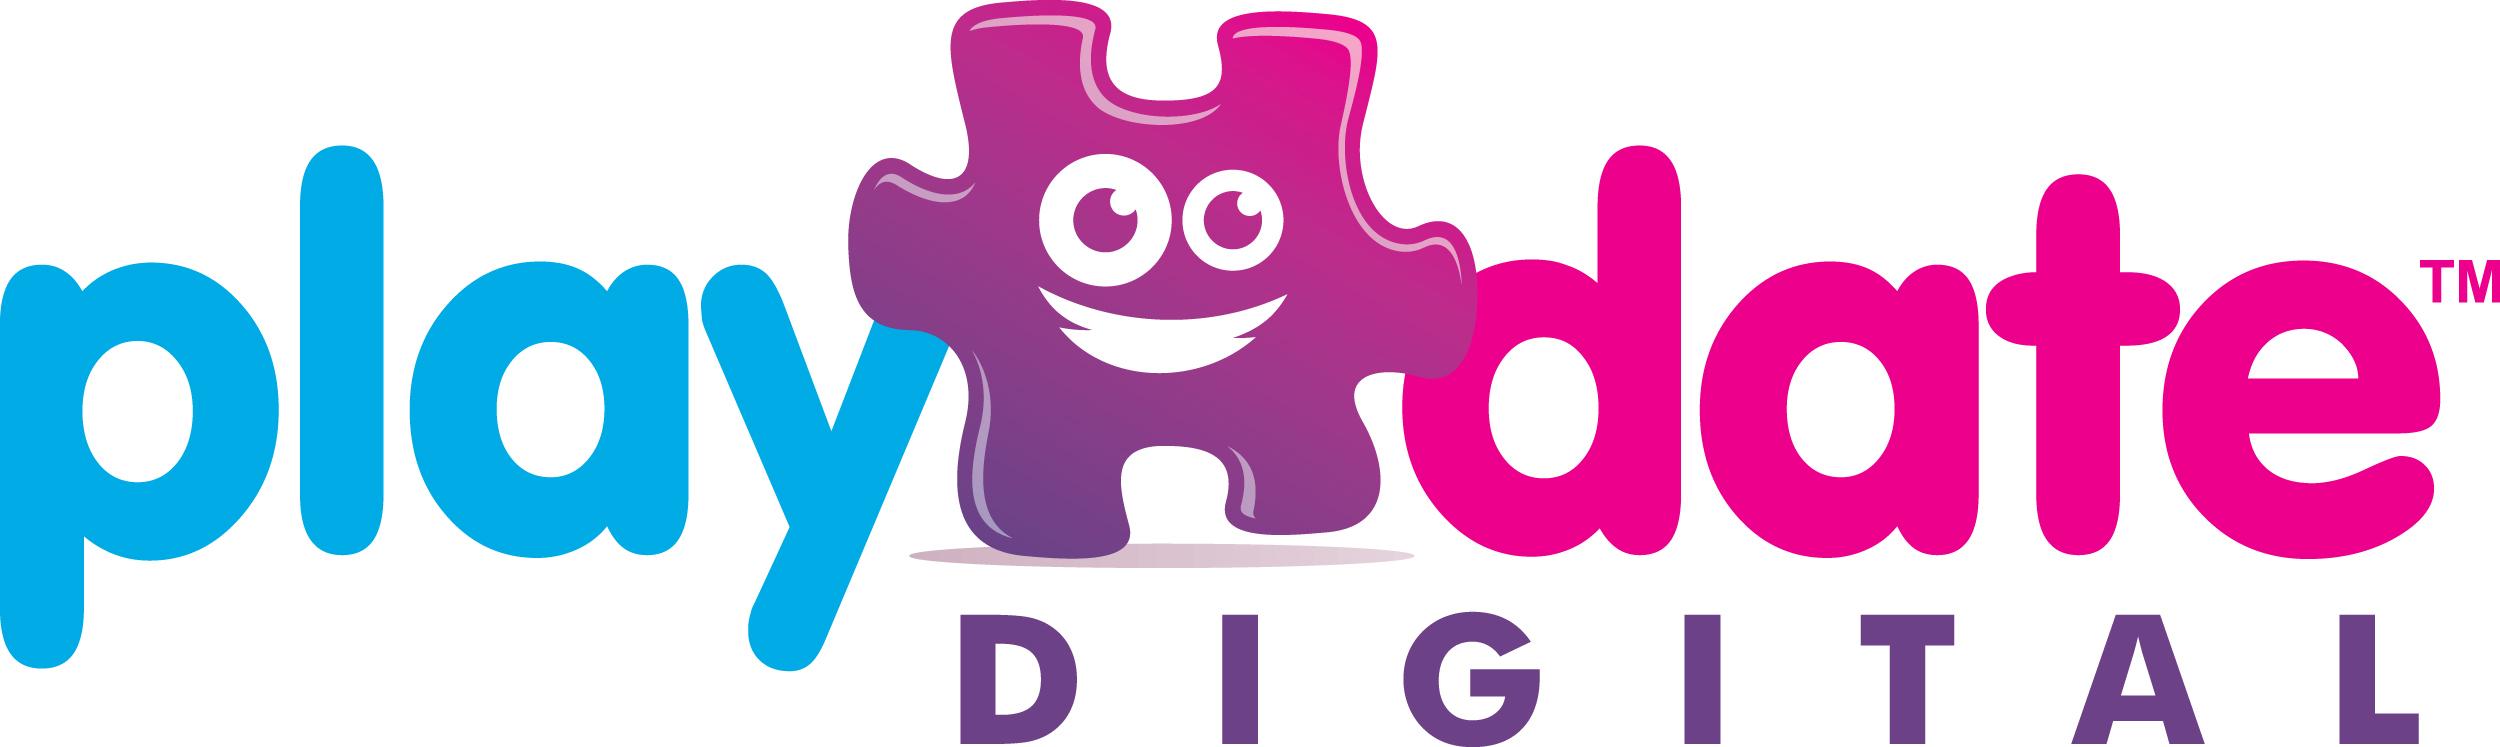 PlayDate Digital Inc.